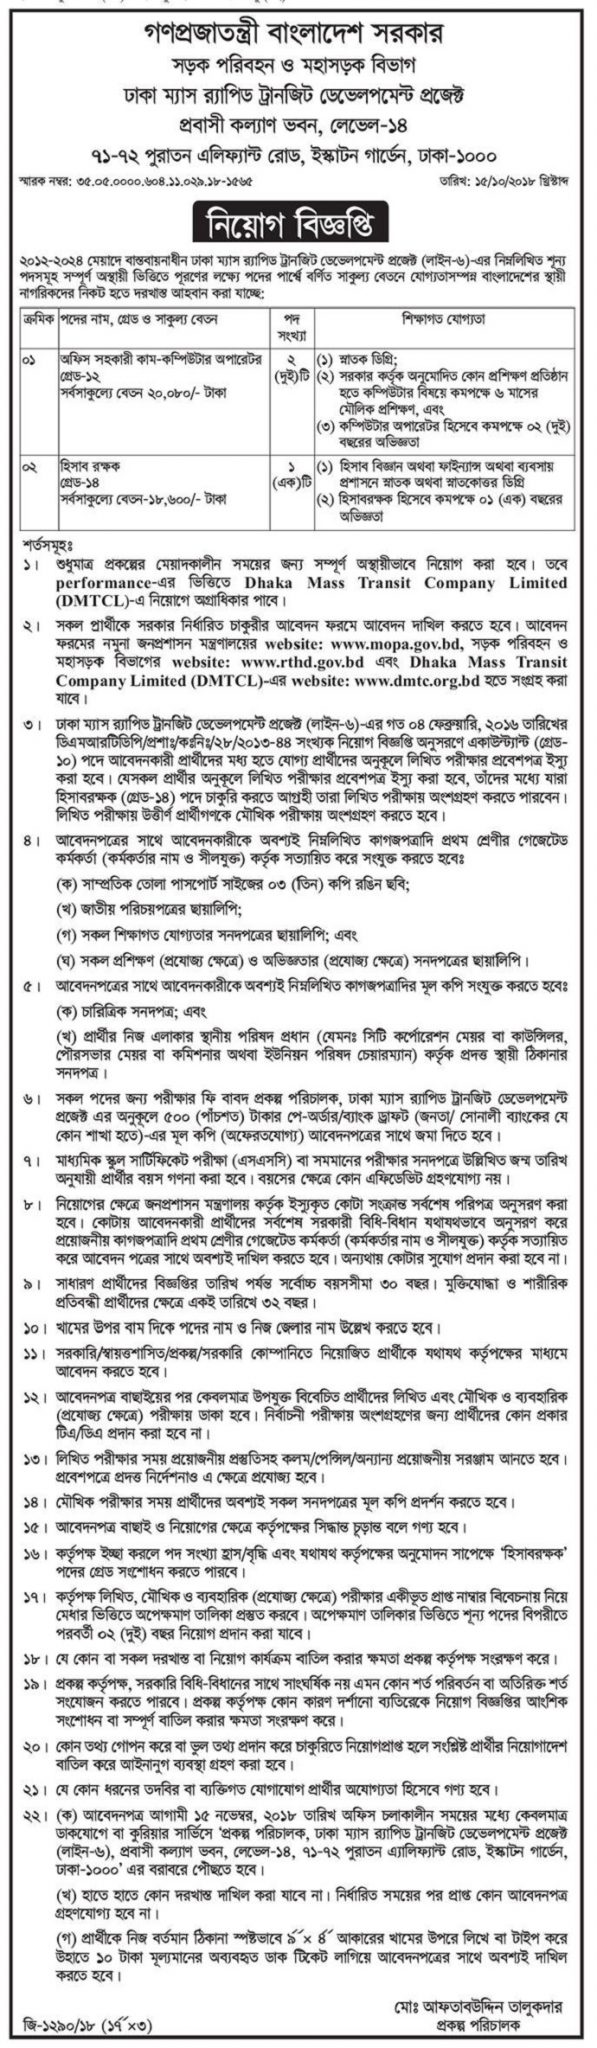 Dhaka Mass Transit Company (Metro Rail) Job Circular 2018 dmtc.org.bd